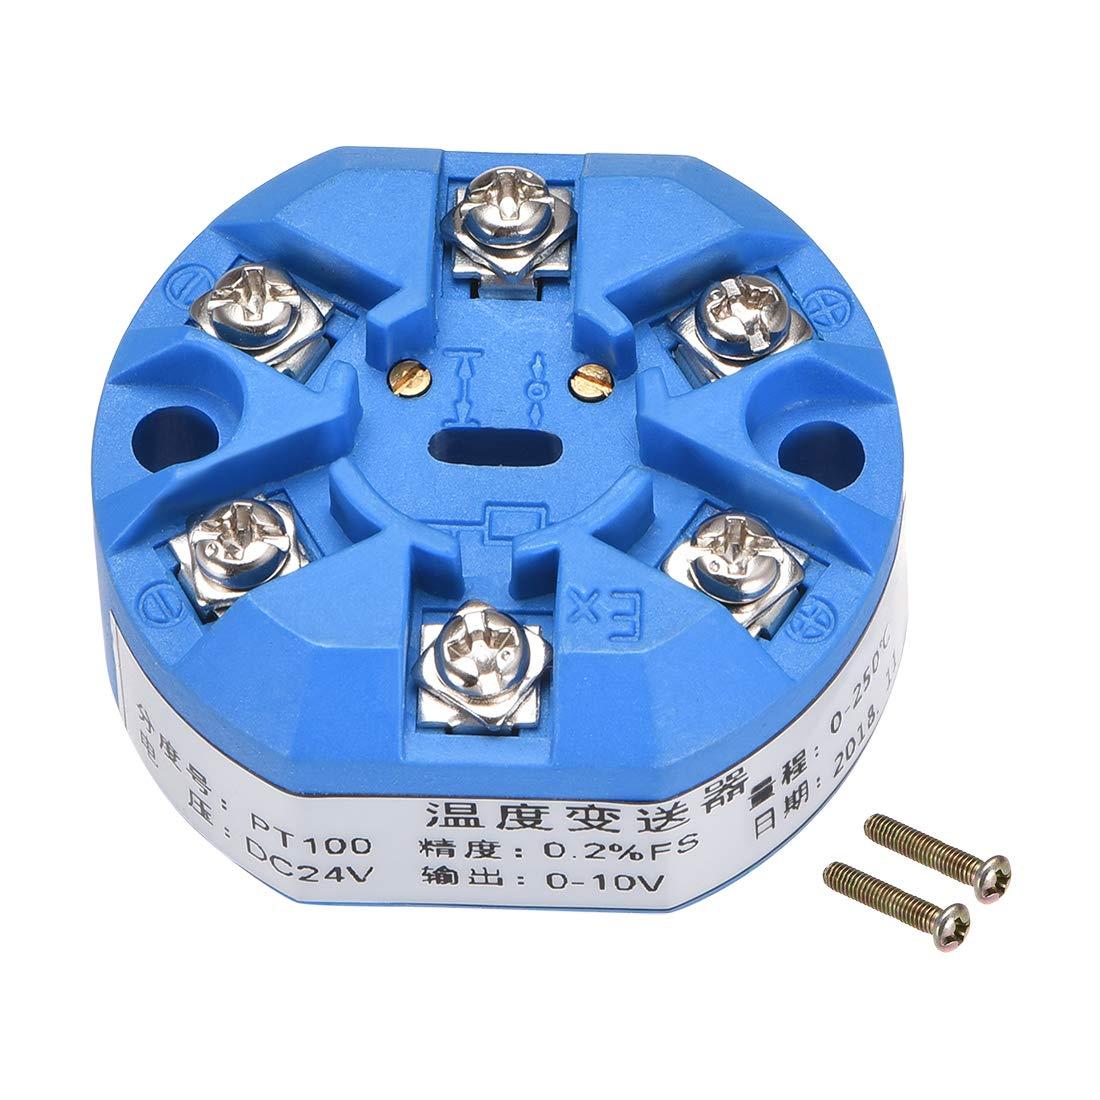 uxcell PT100 Temperature Sensor Transmitter 24V DC 0-10V 0℃ to 250℃